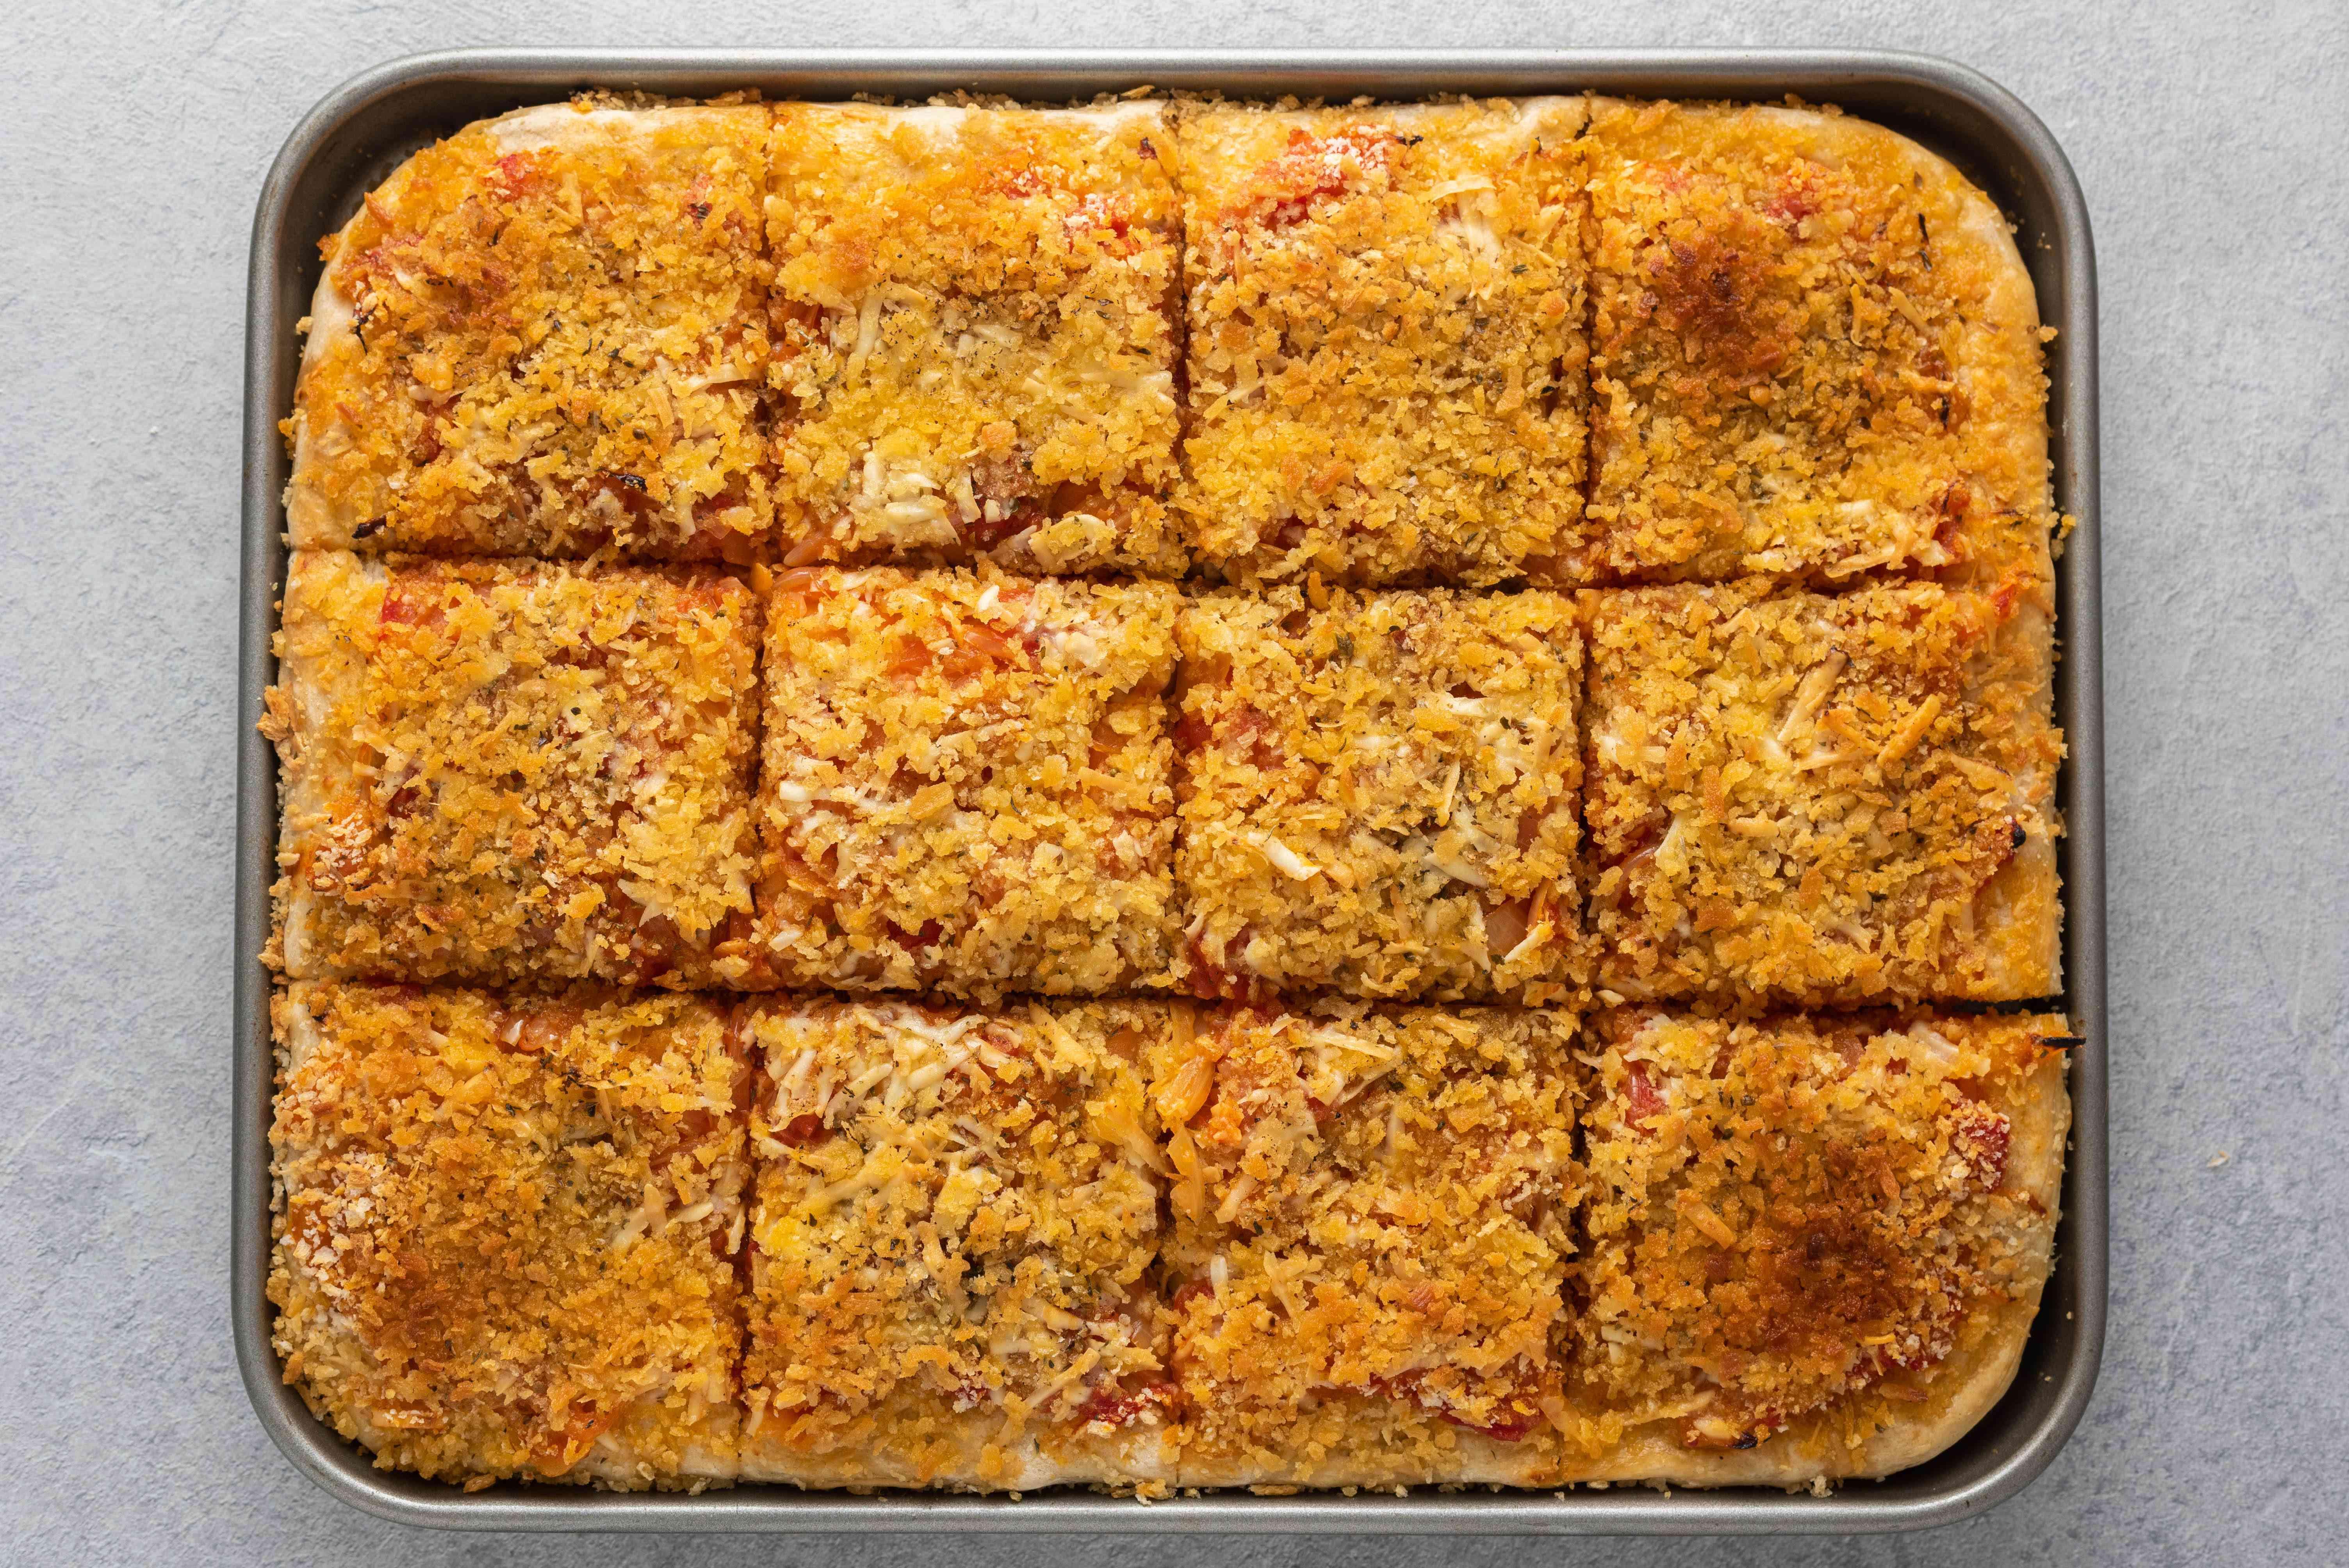 sliced Lo Sfincione, The Original Sicilian-Style Pizza on a baking sheet